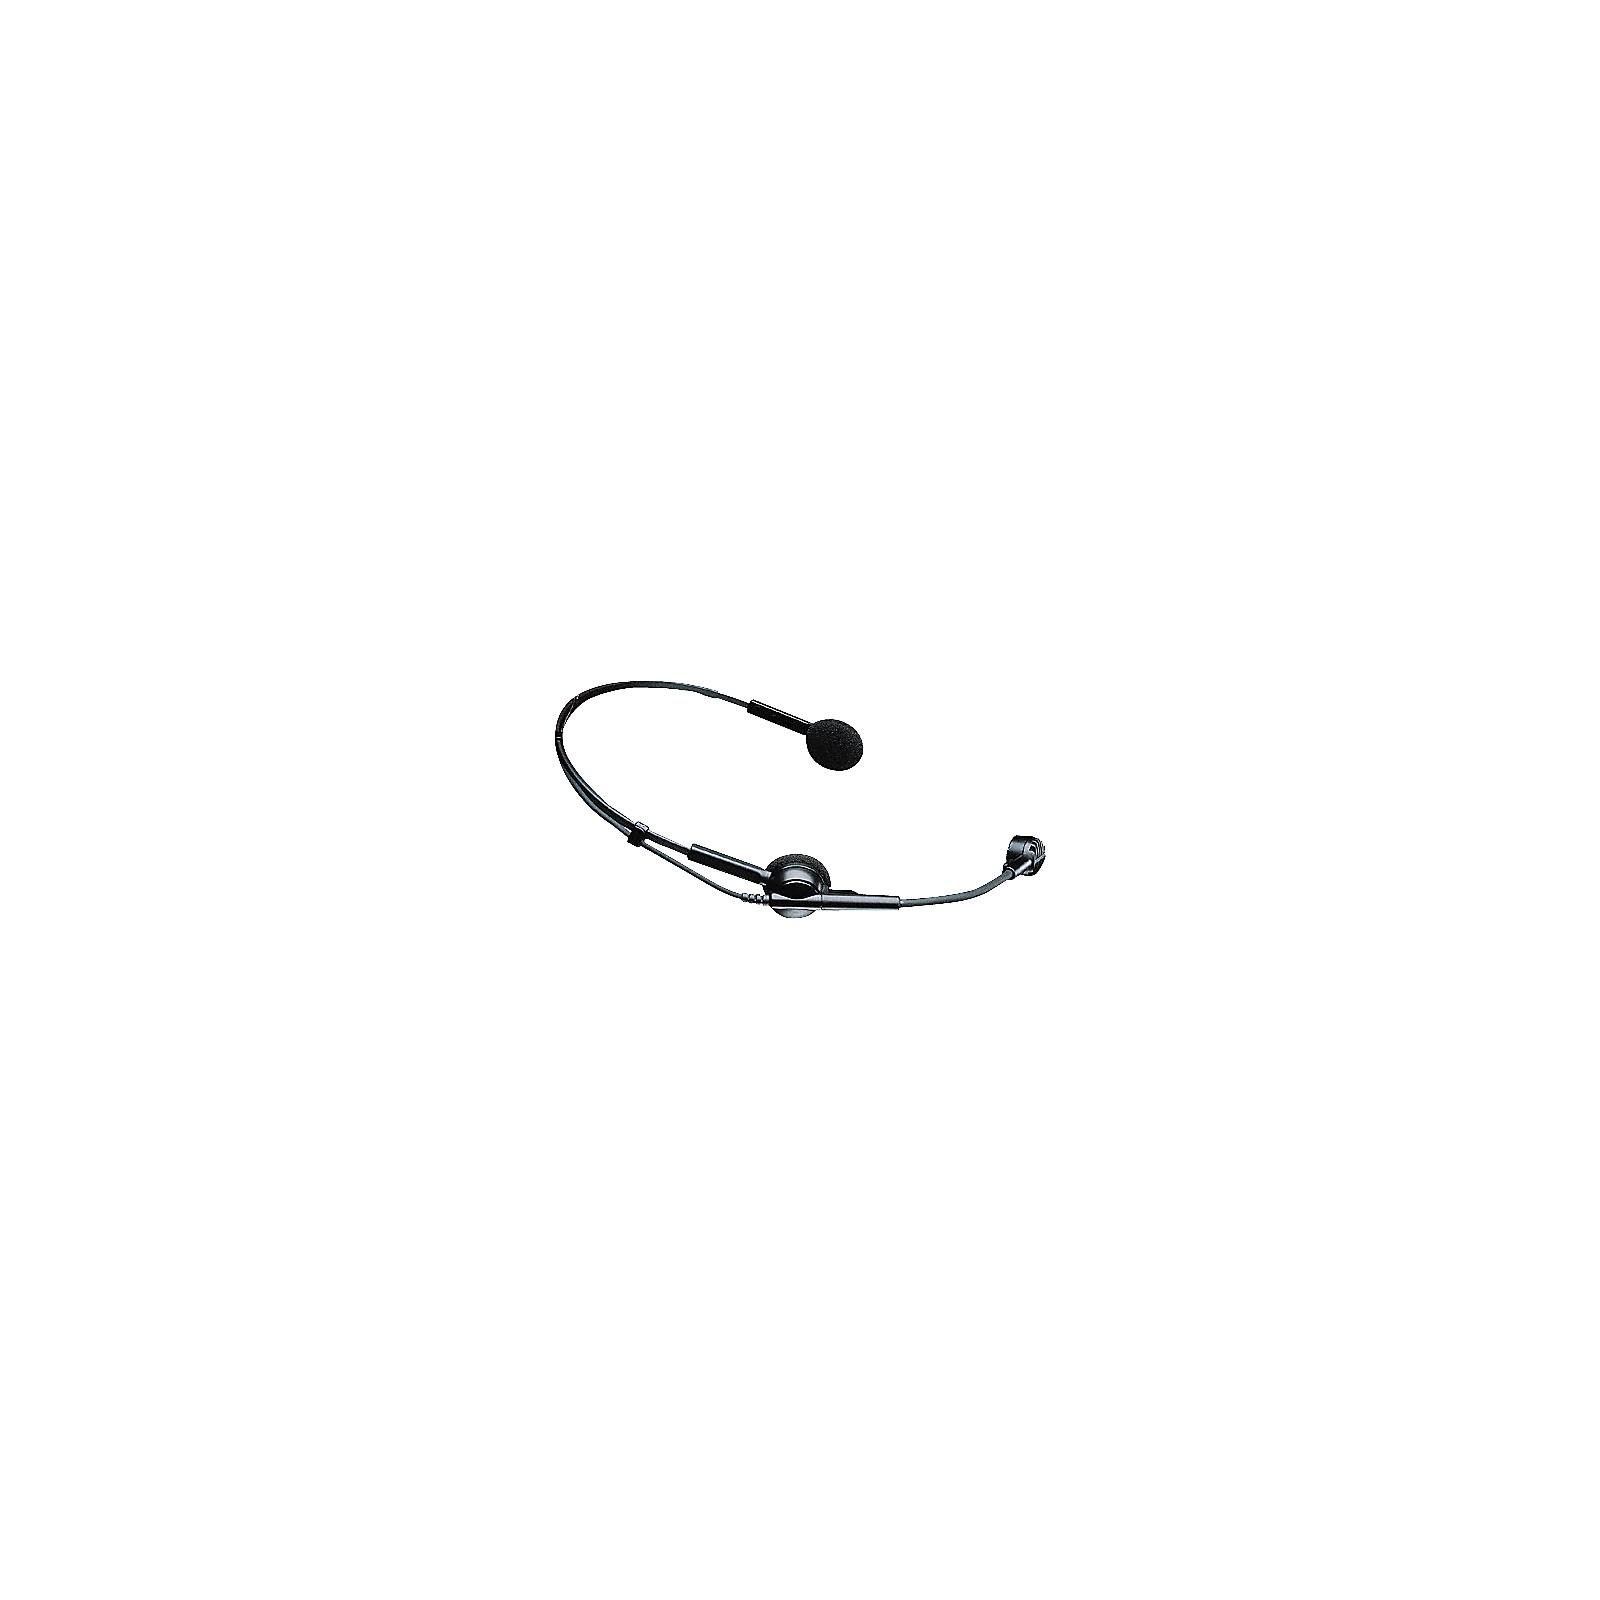 Open Box Audio-Technica ATM75 Cardioid Condenser Headworn Microphone